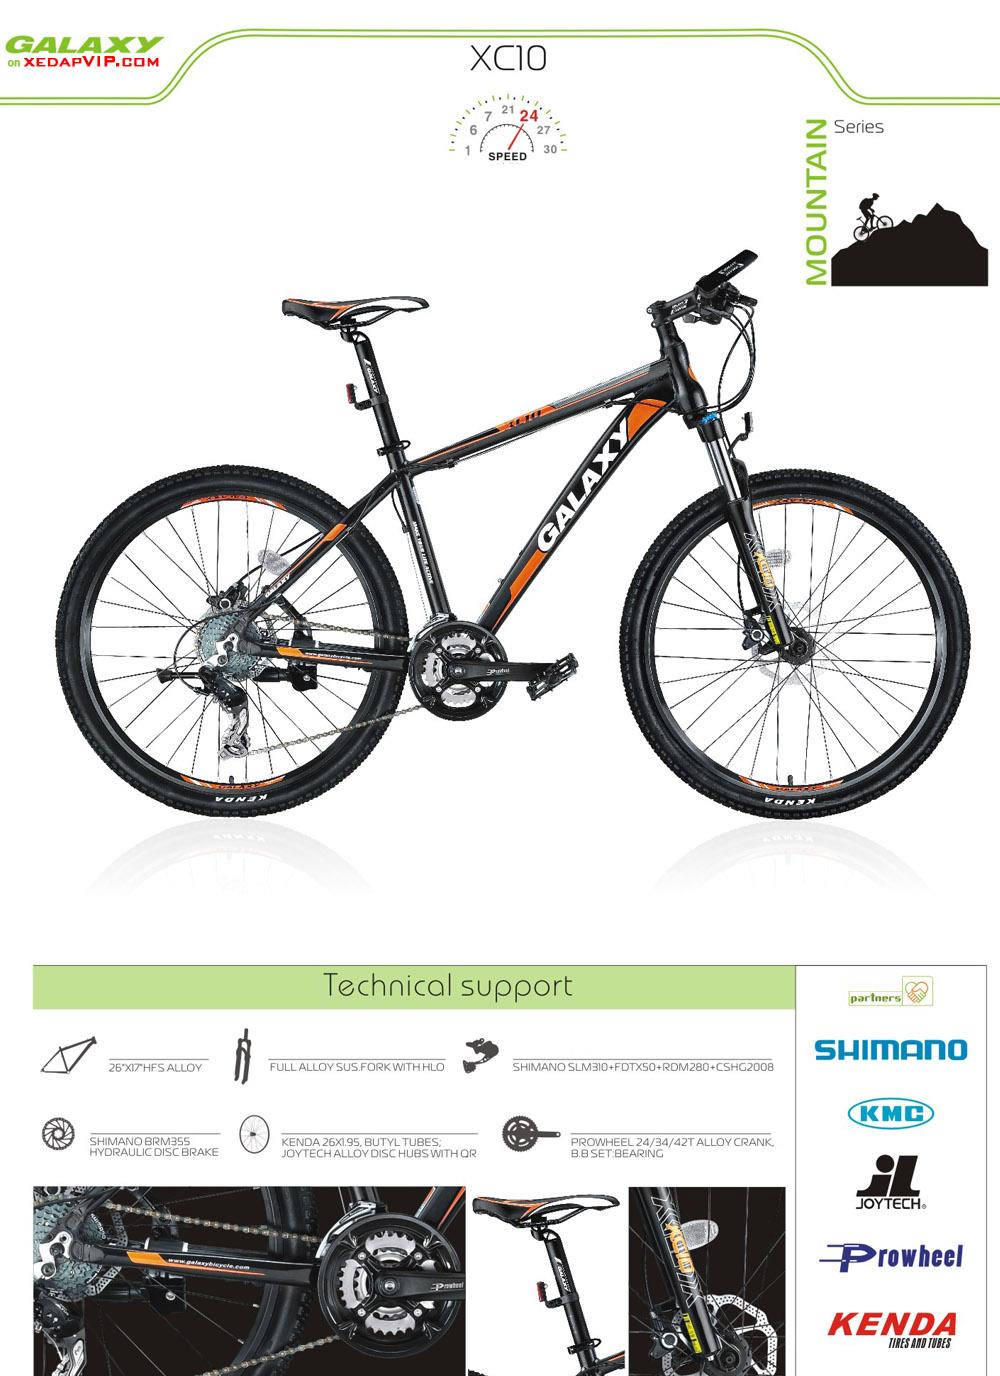 Xe dap the thao GALAXY XC10, xe dap the thao, xe dap trinx, xe đạp thể thao chính hãng, xe dap asama, xc10